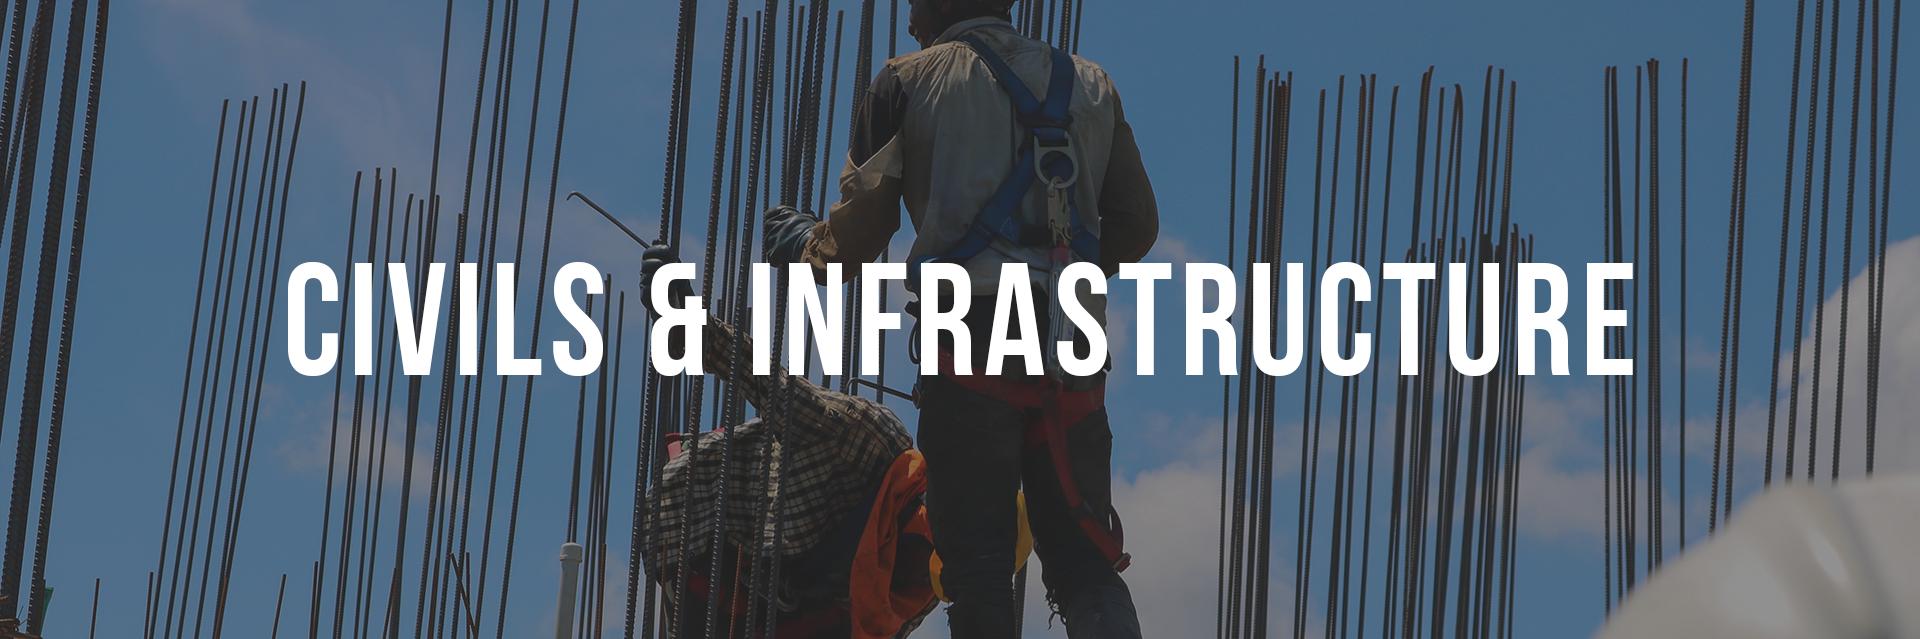 Civils & Infrastructure